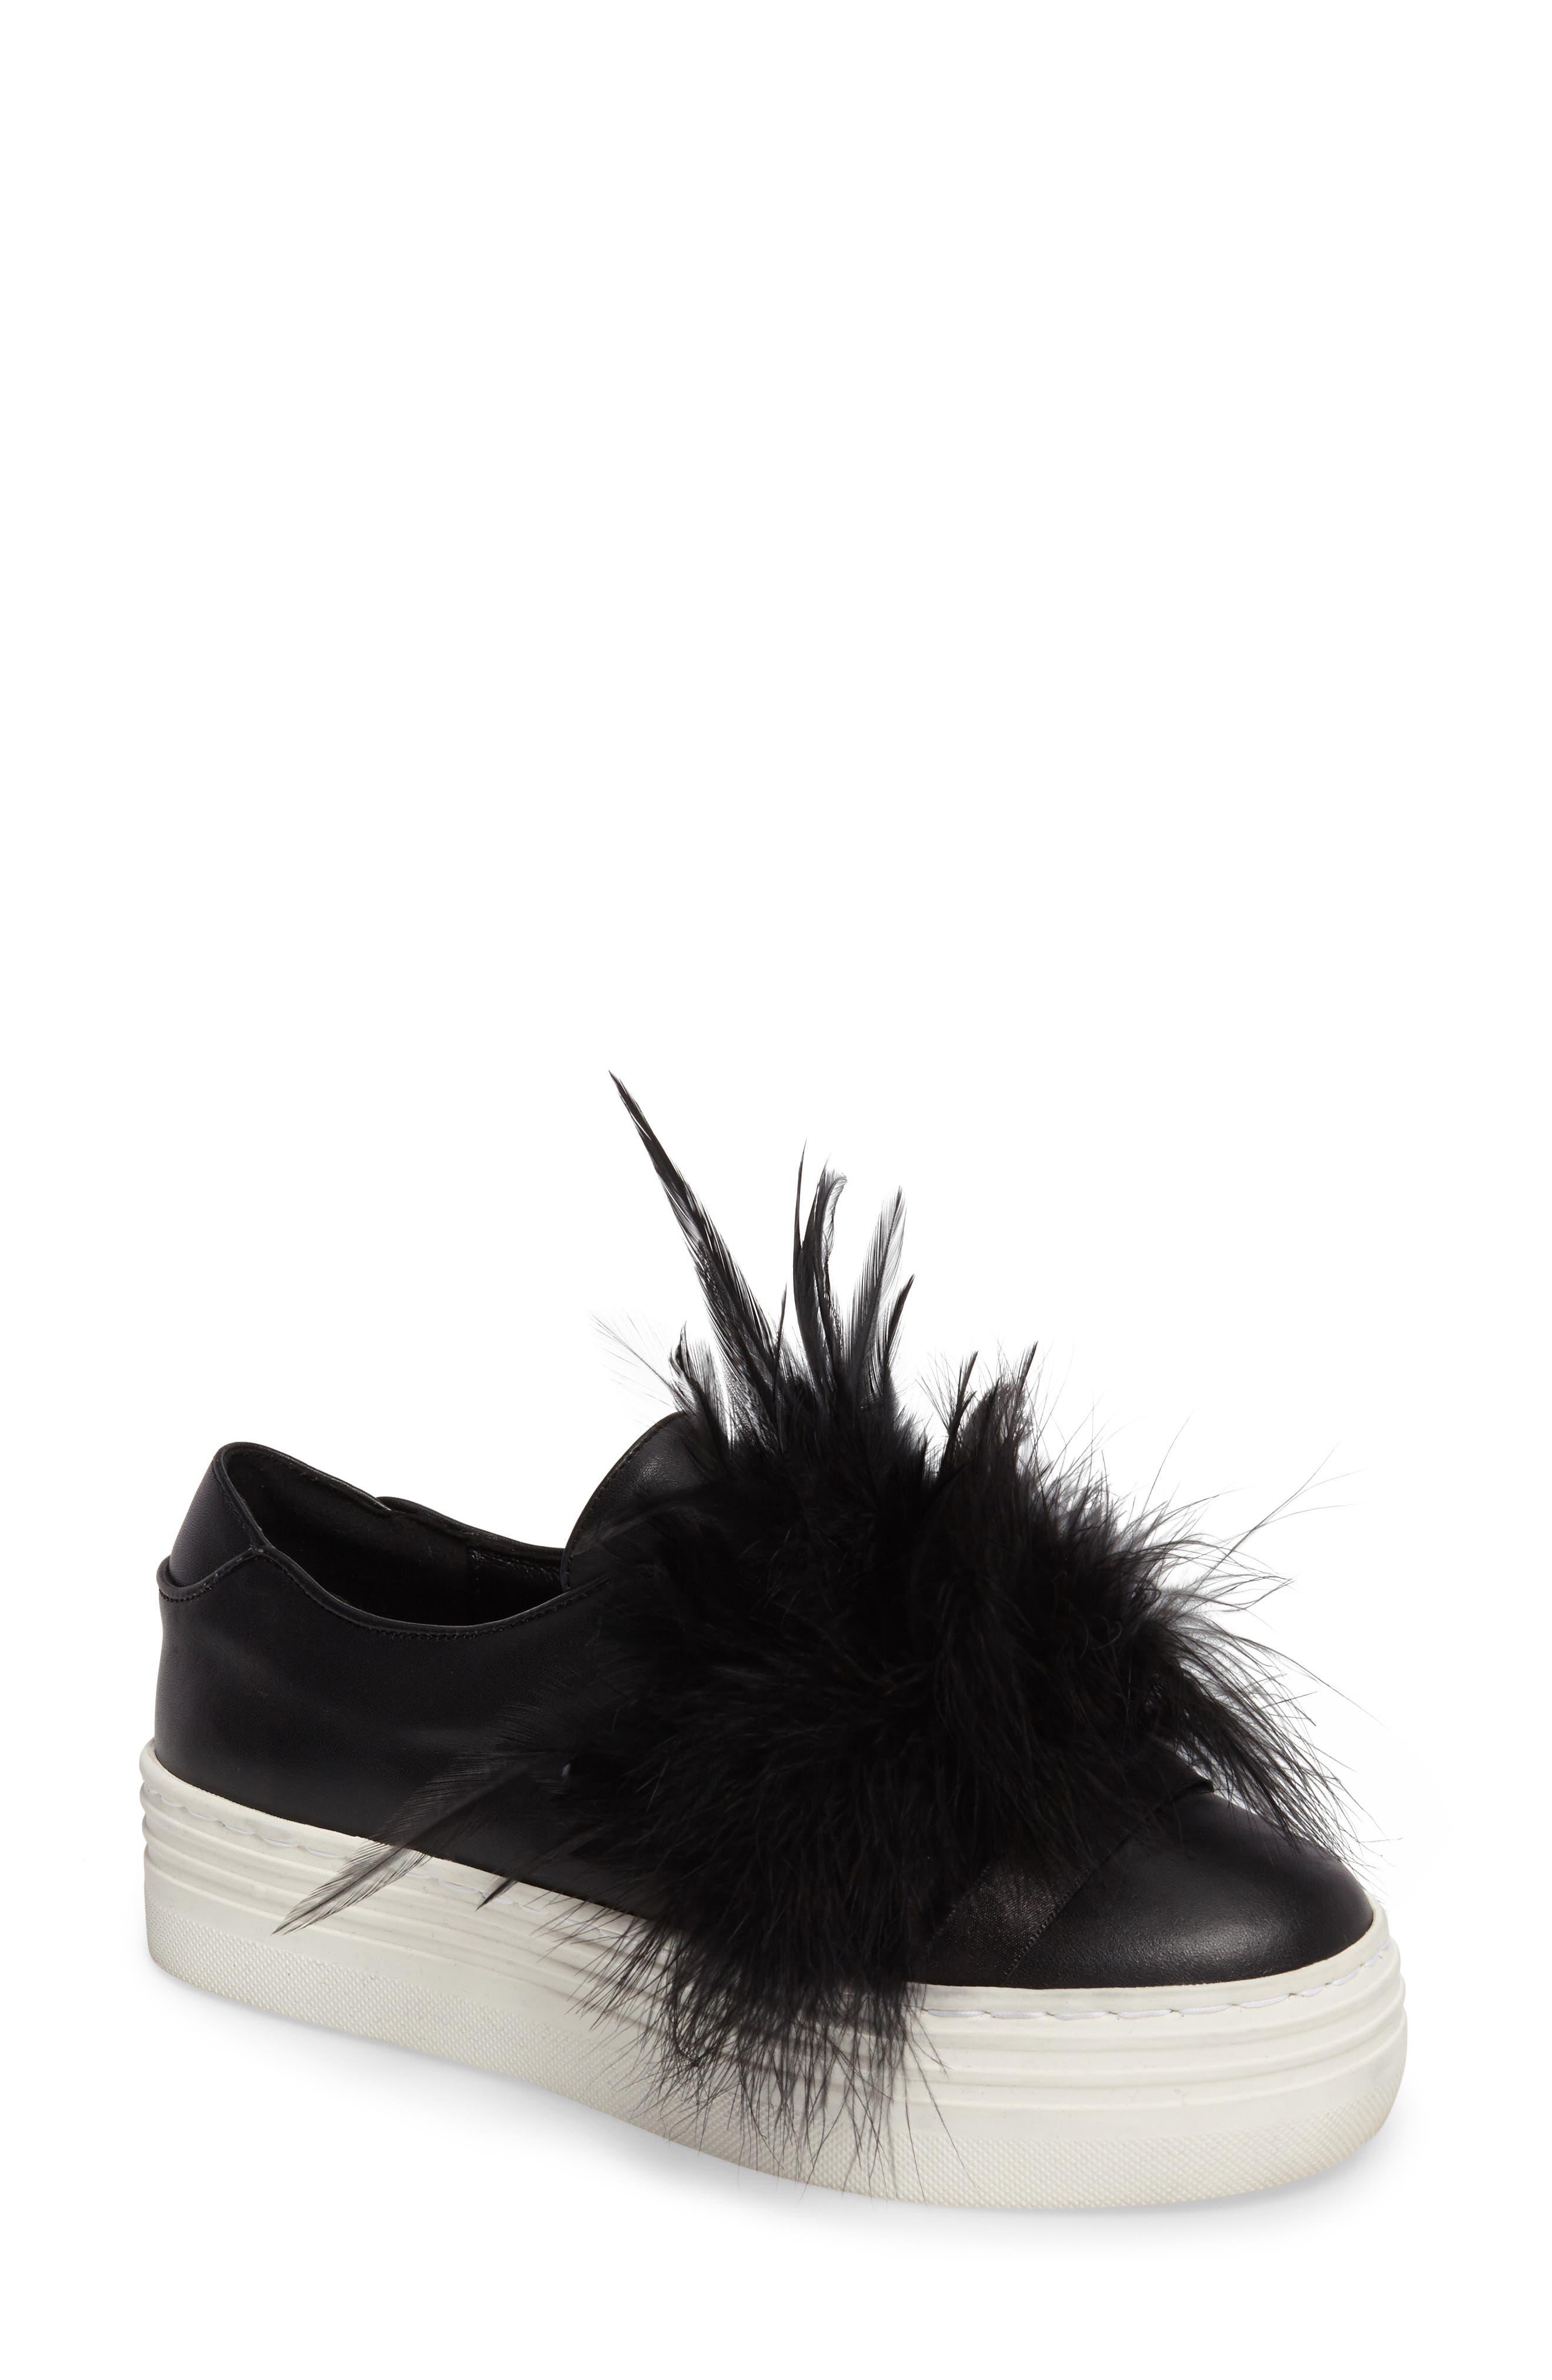 Lily Feather Pom Slip-On Platform Sneaker,                         Main,                         color, 001